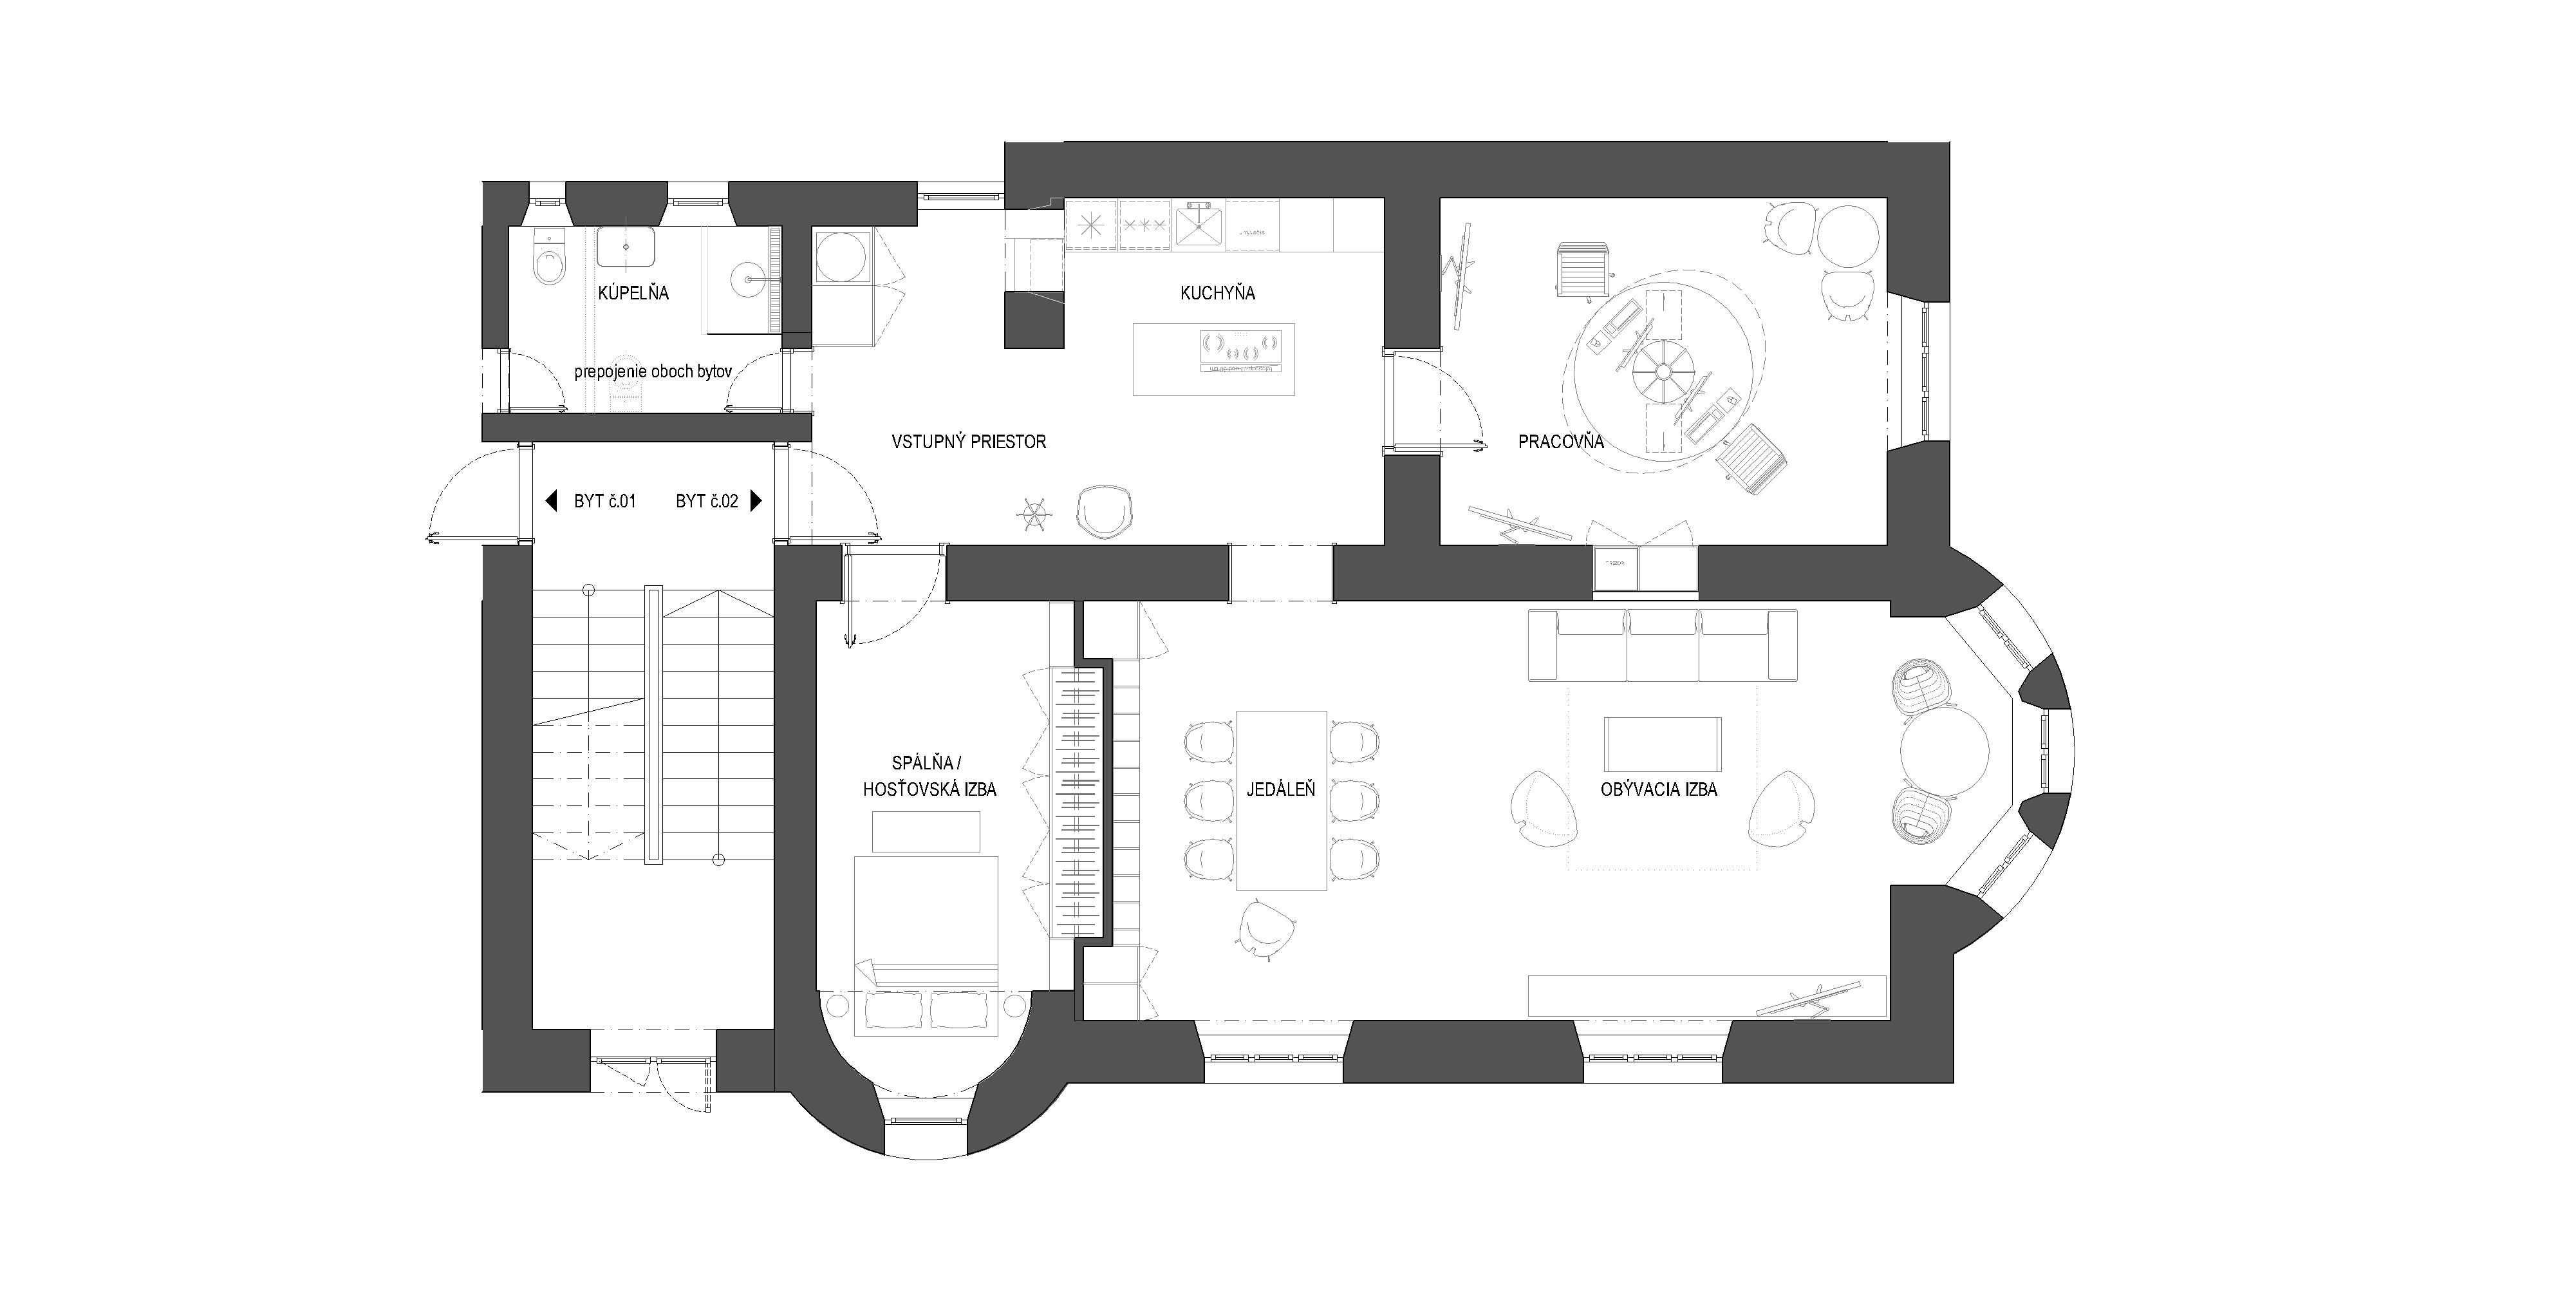 interier-bytu-rekonstrukcia-palisady-Bratislava-podorys-01-po-rekonstrukcii-navrh-svieza-dispozicia